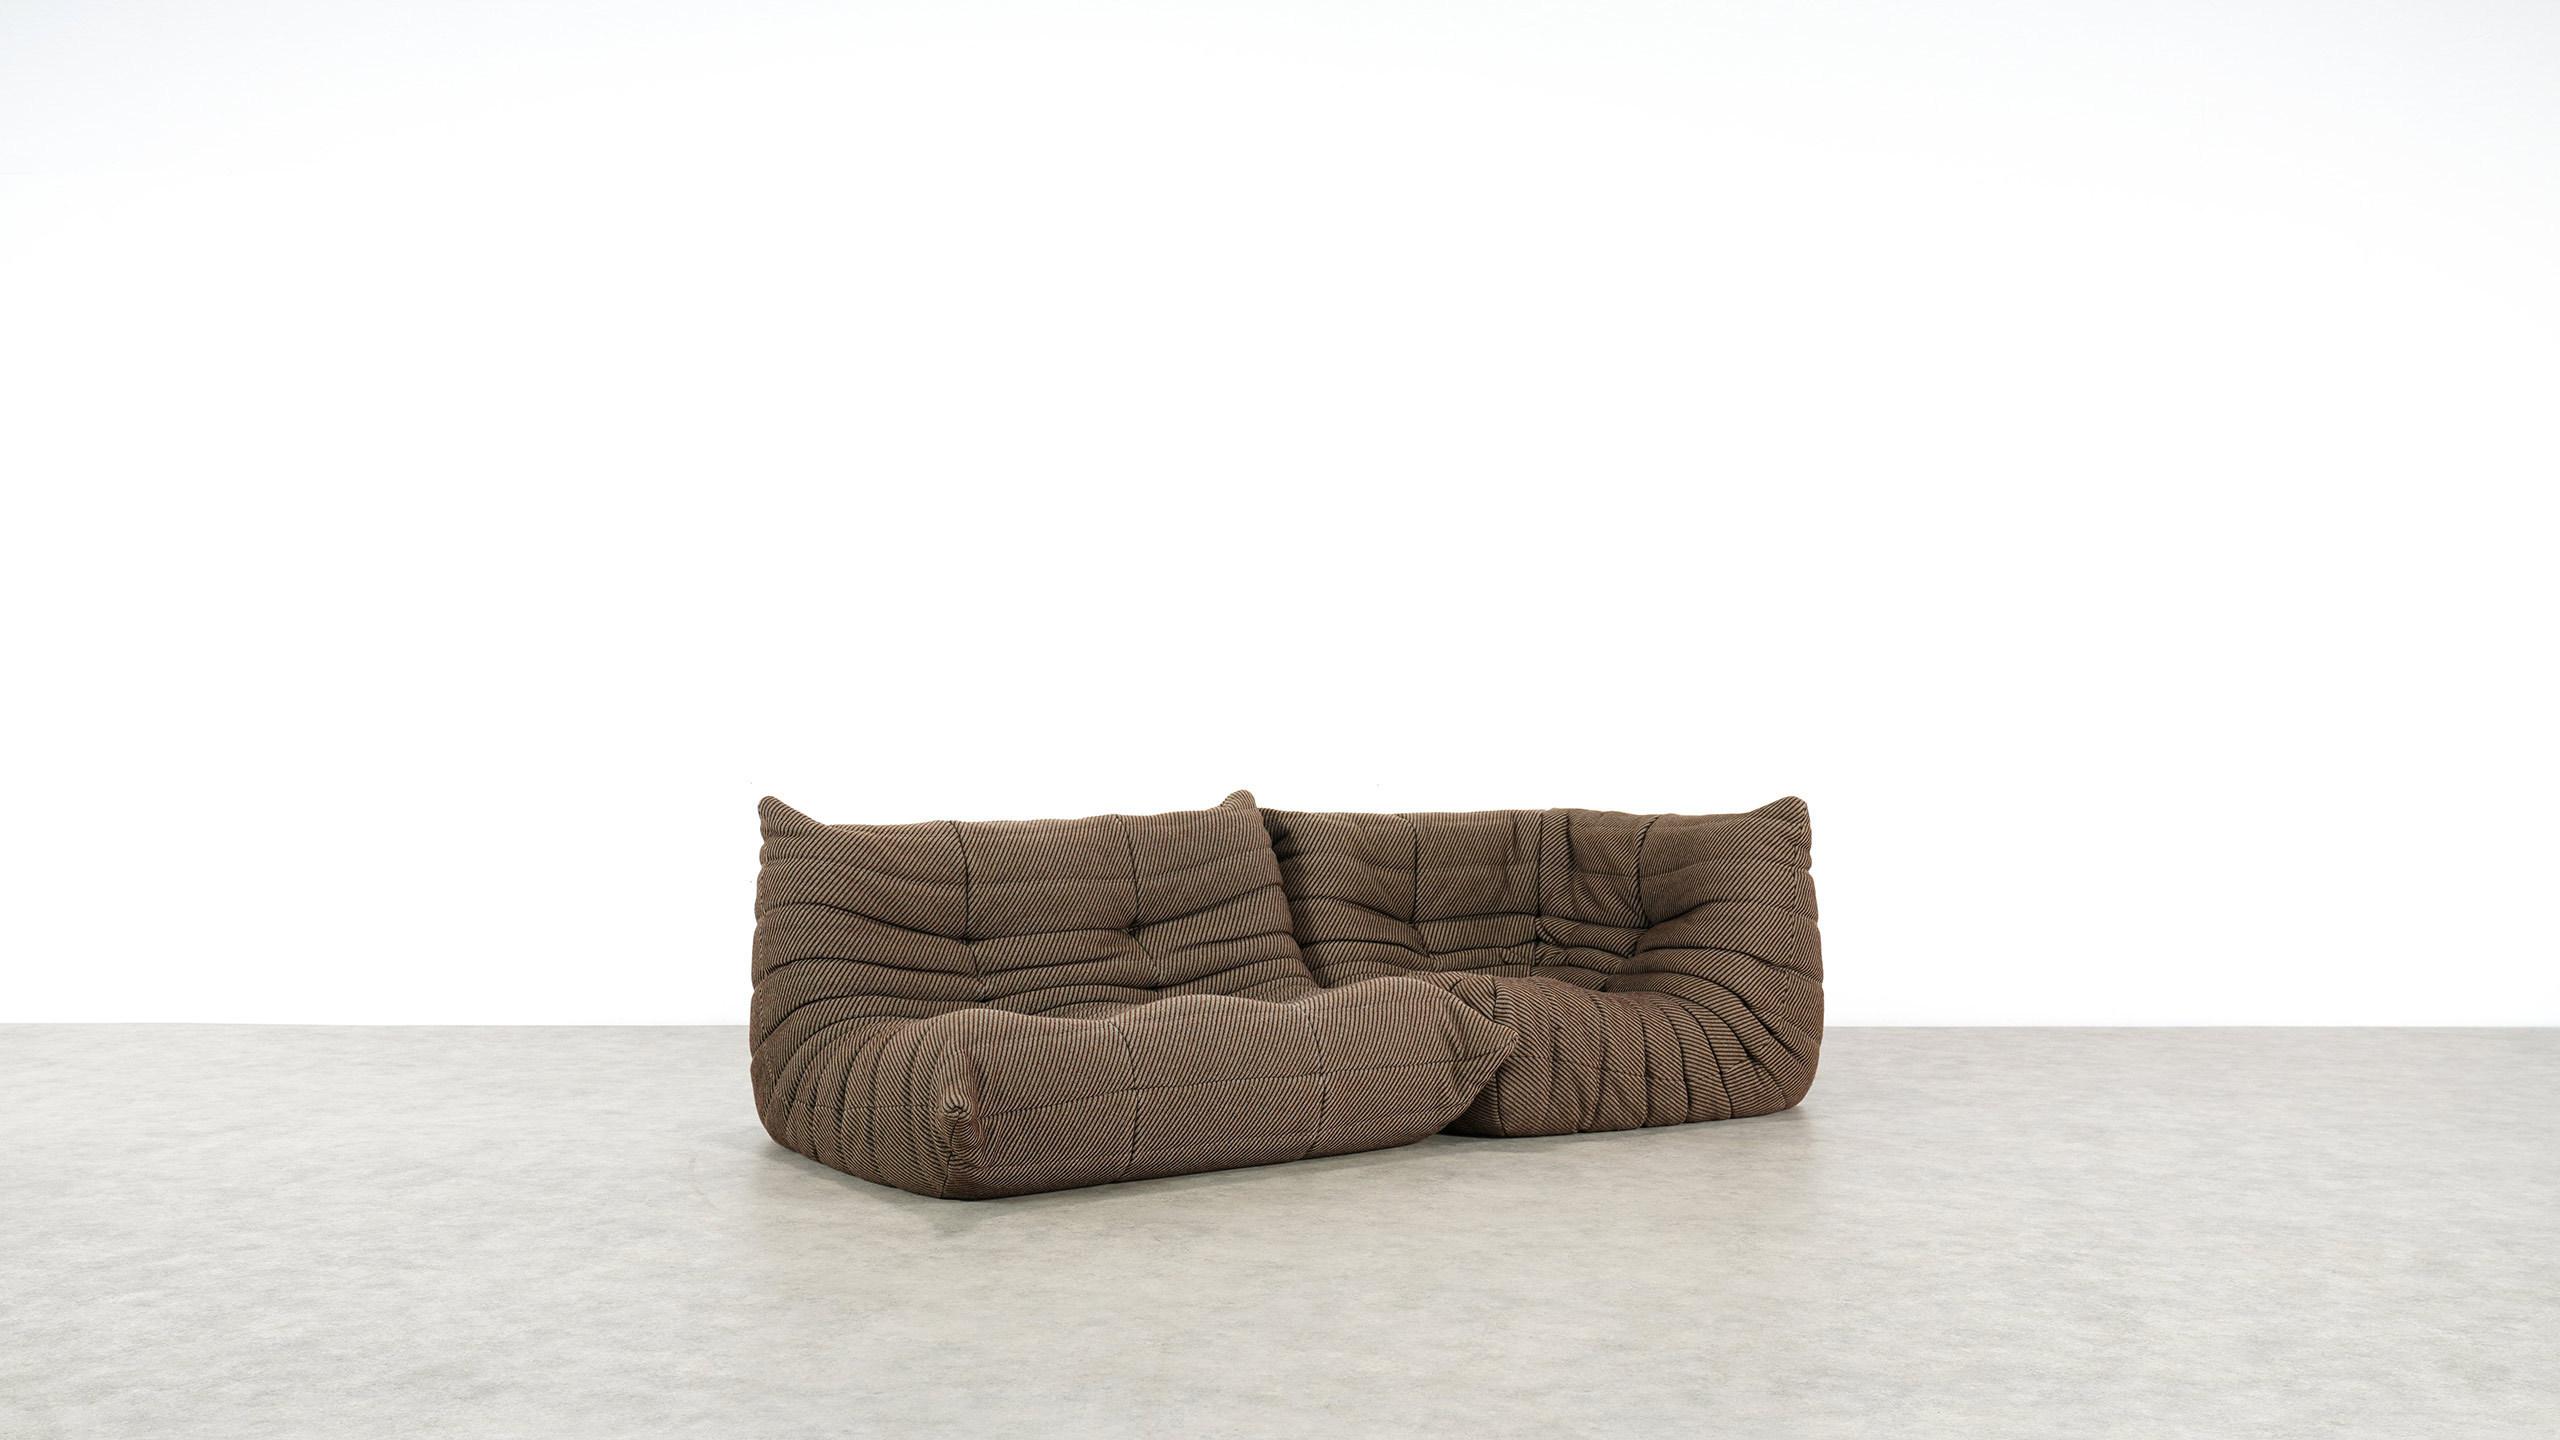 Full Size of Ligne Roset Sofa Yang For Sale Ebay Bed Instructions Togo Ireland Used Furniture Uk Replica Multy Second Hand Confluences Kleinanzeigen Cleaning Michel Ducaroy Sofa Ligne Roset Sofa